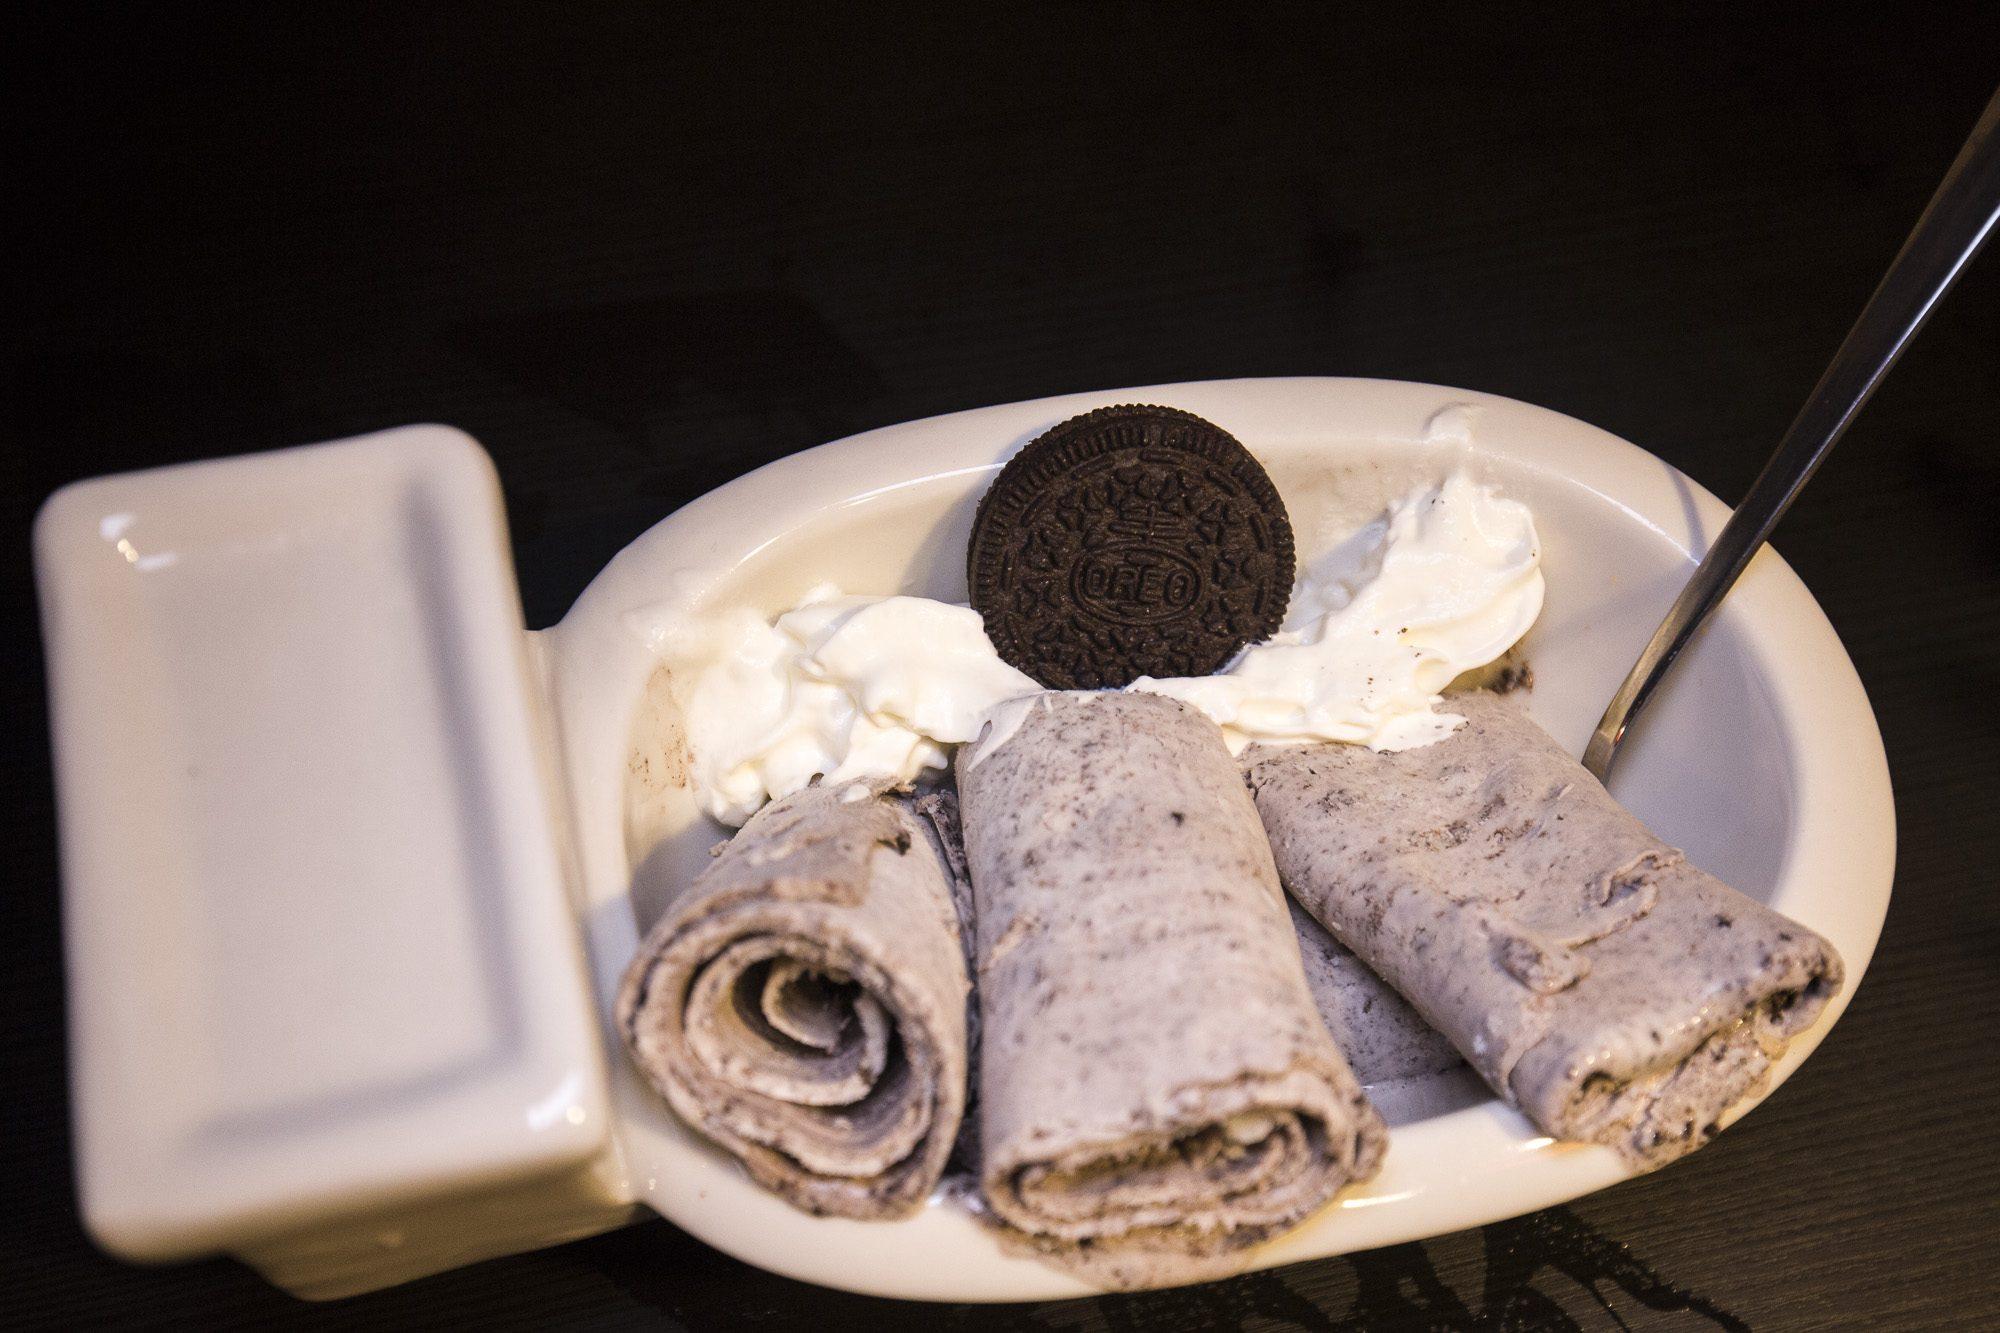 toronto-streeters-first-poop-cafe-annex-oreo-thai-ice-cream-juhi